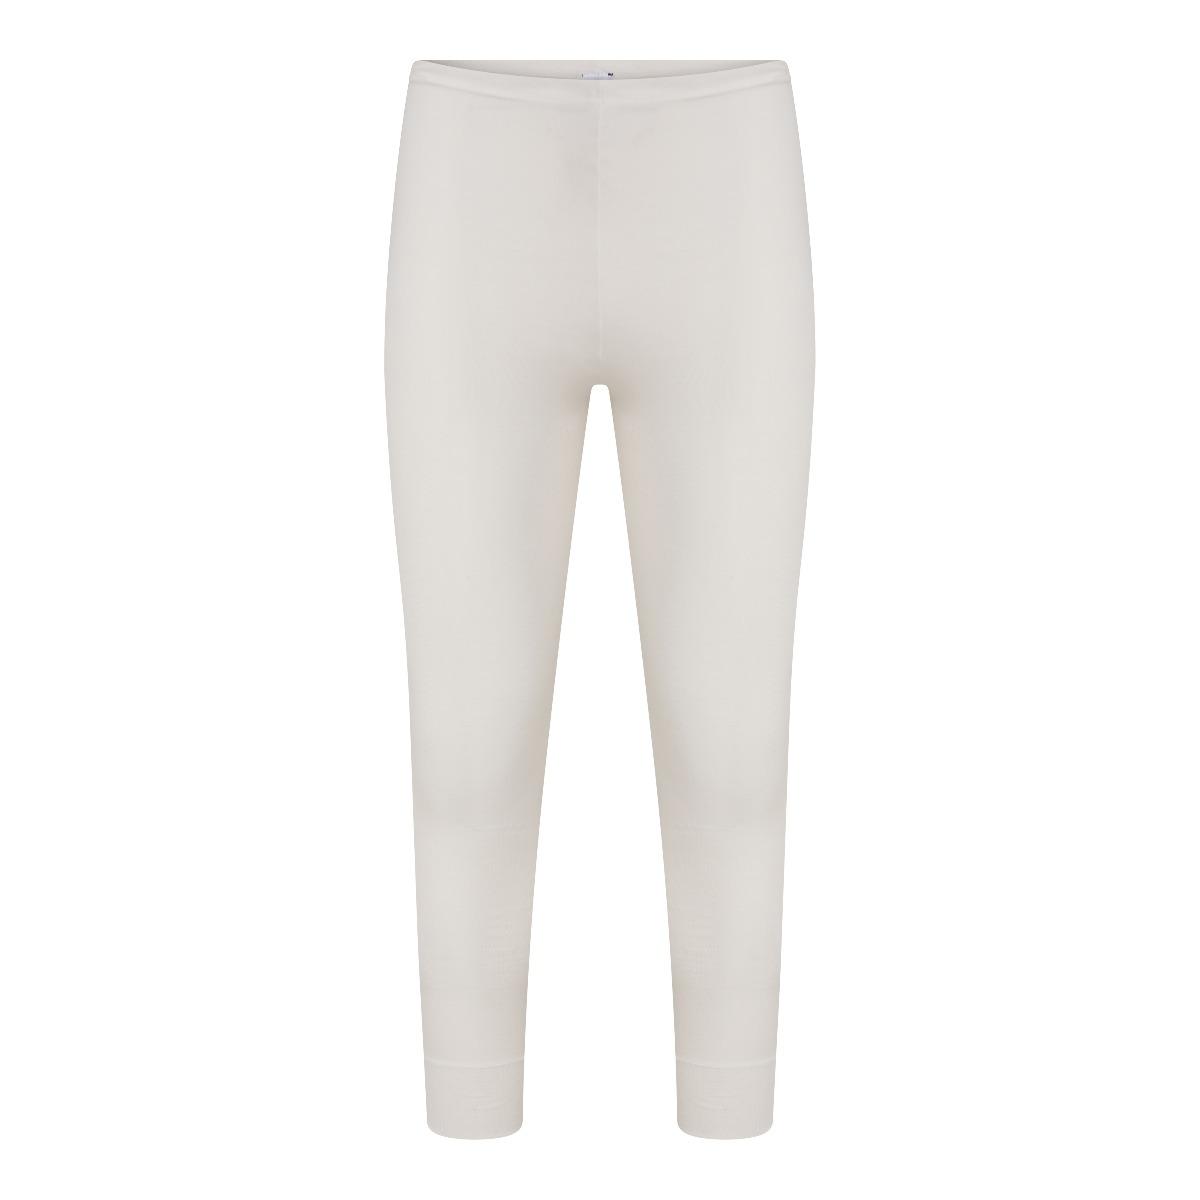 Beeren Thermo Unisex Pantalon Wolwit M